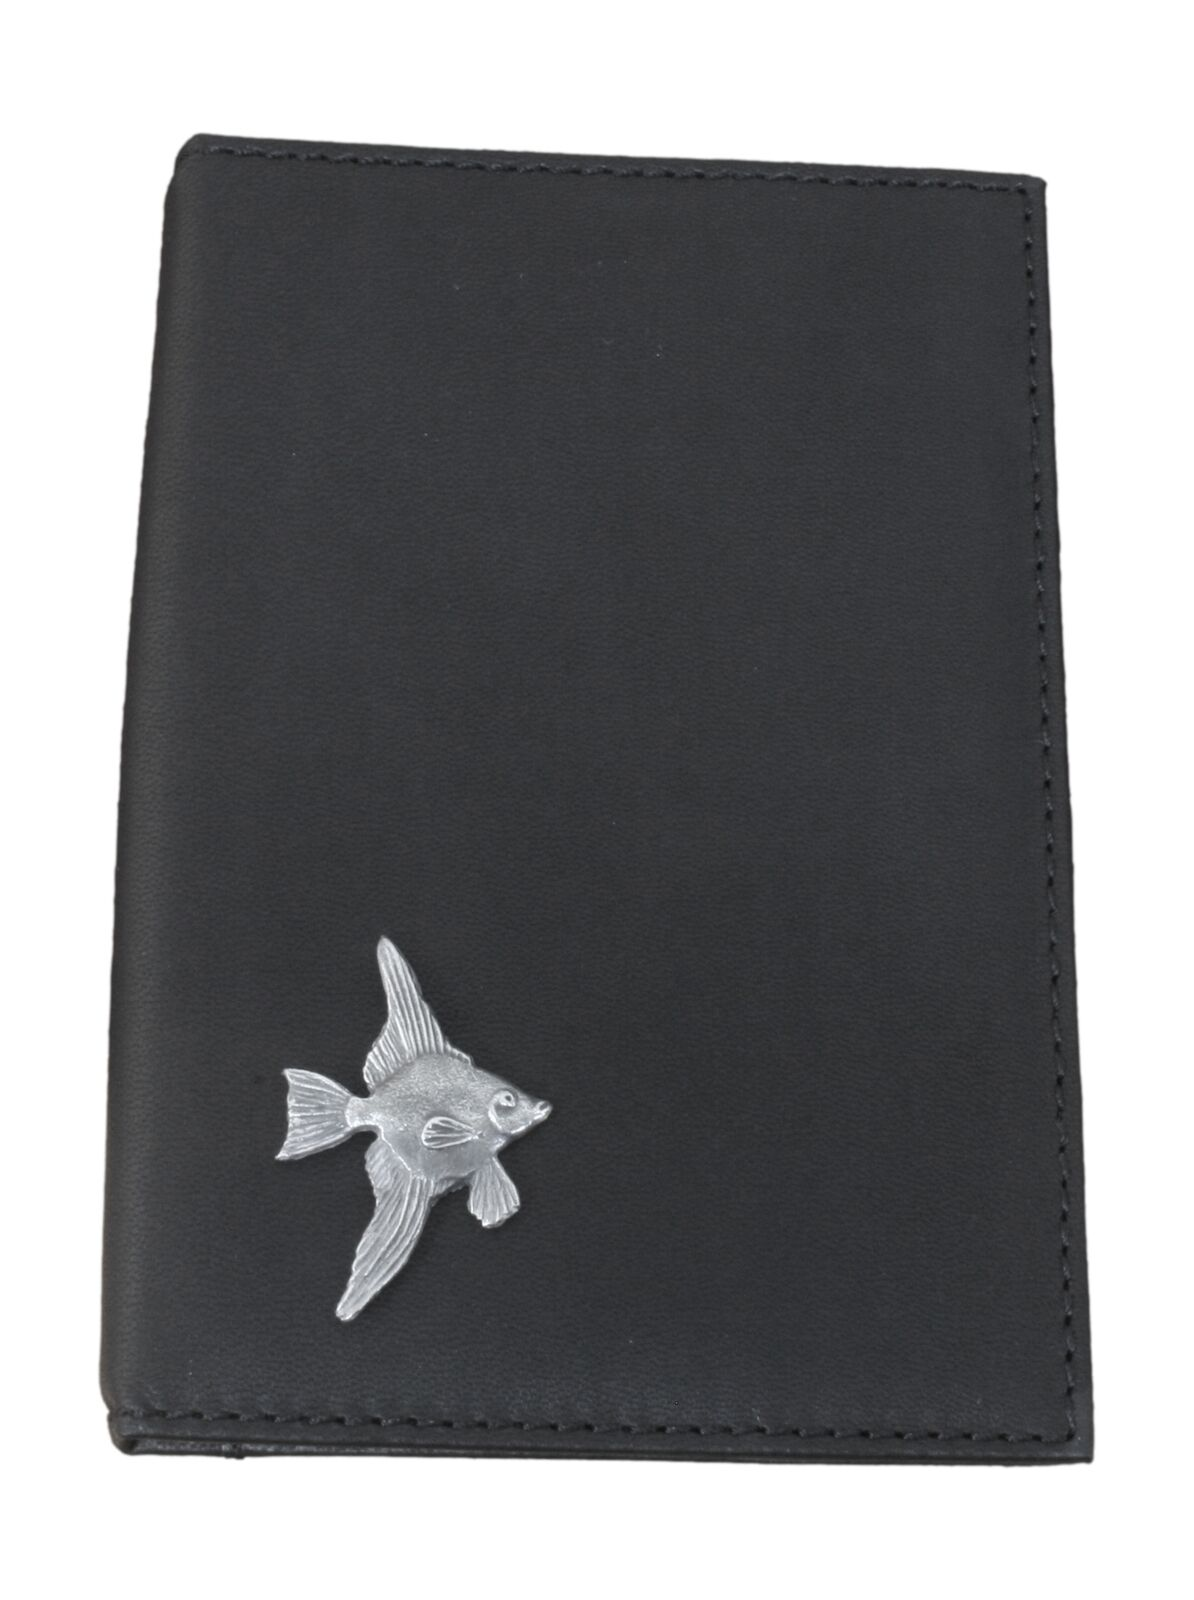 Angelfish Black Leather Shotgun/Firearms Certificate Holder 6